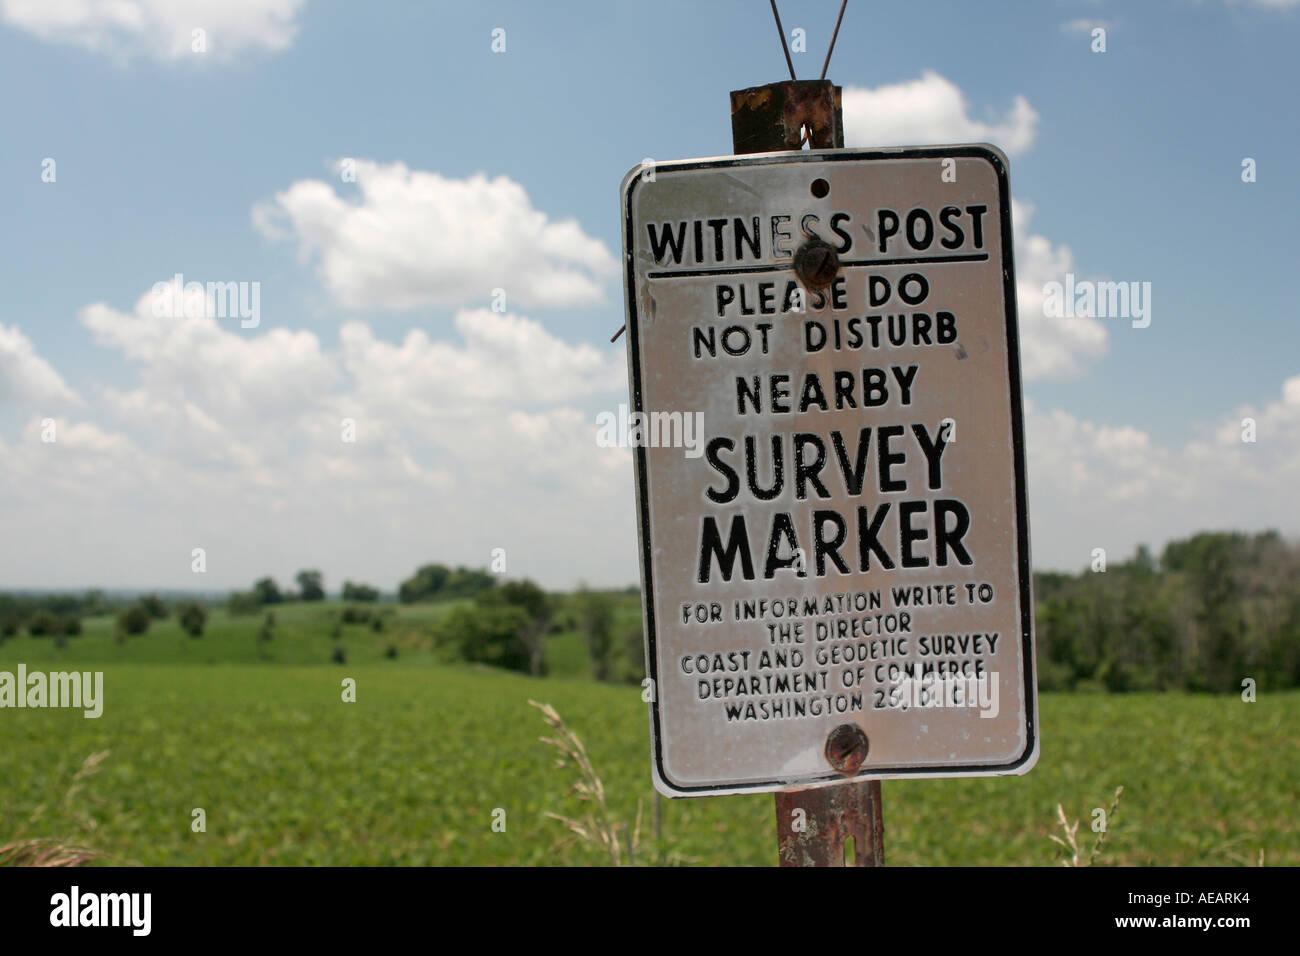 USGS Survey Marker Witness Post - Stock Image